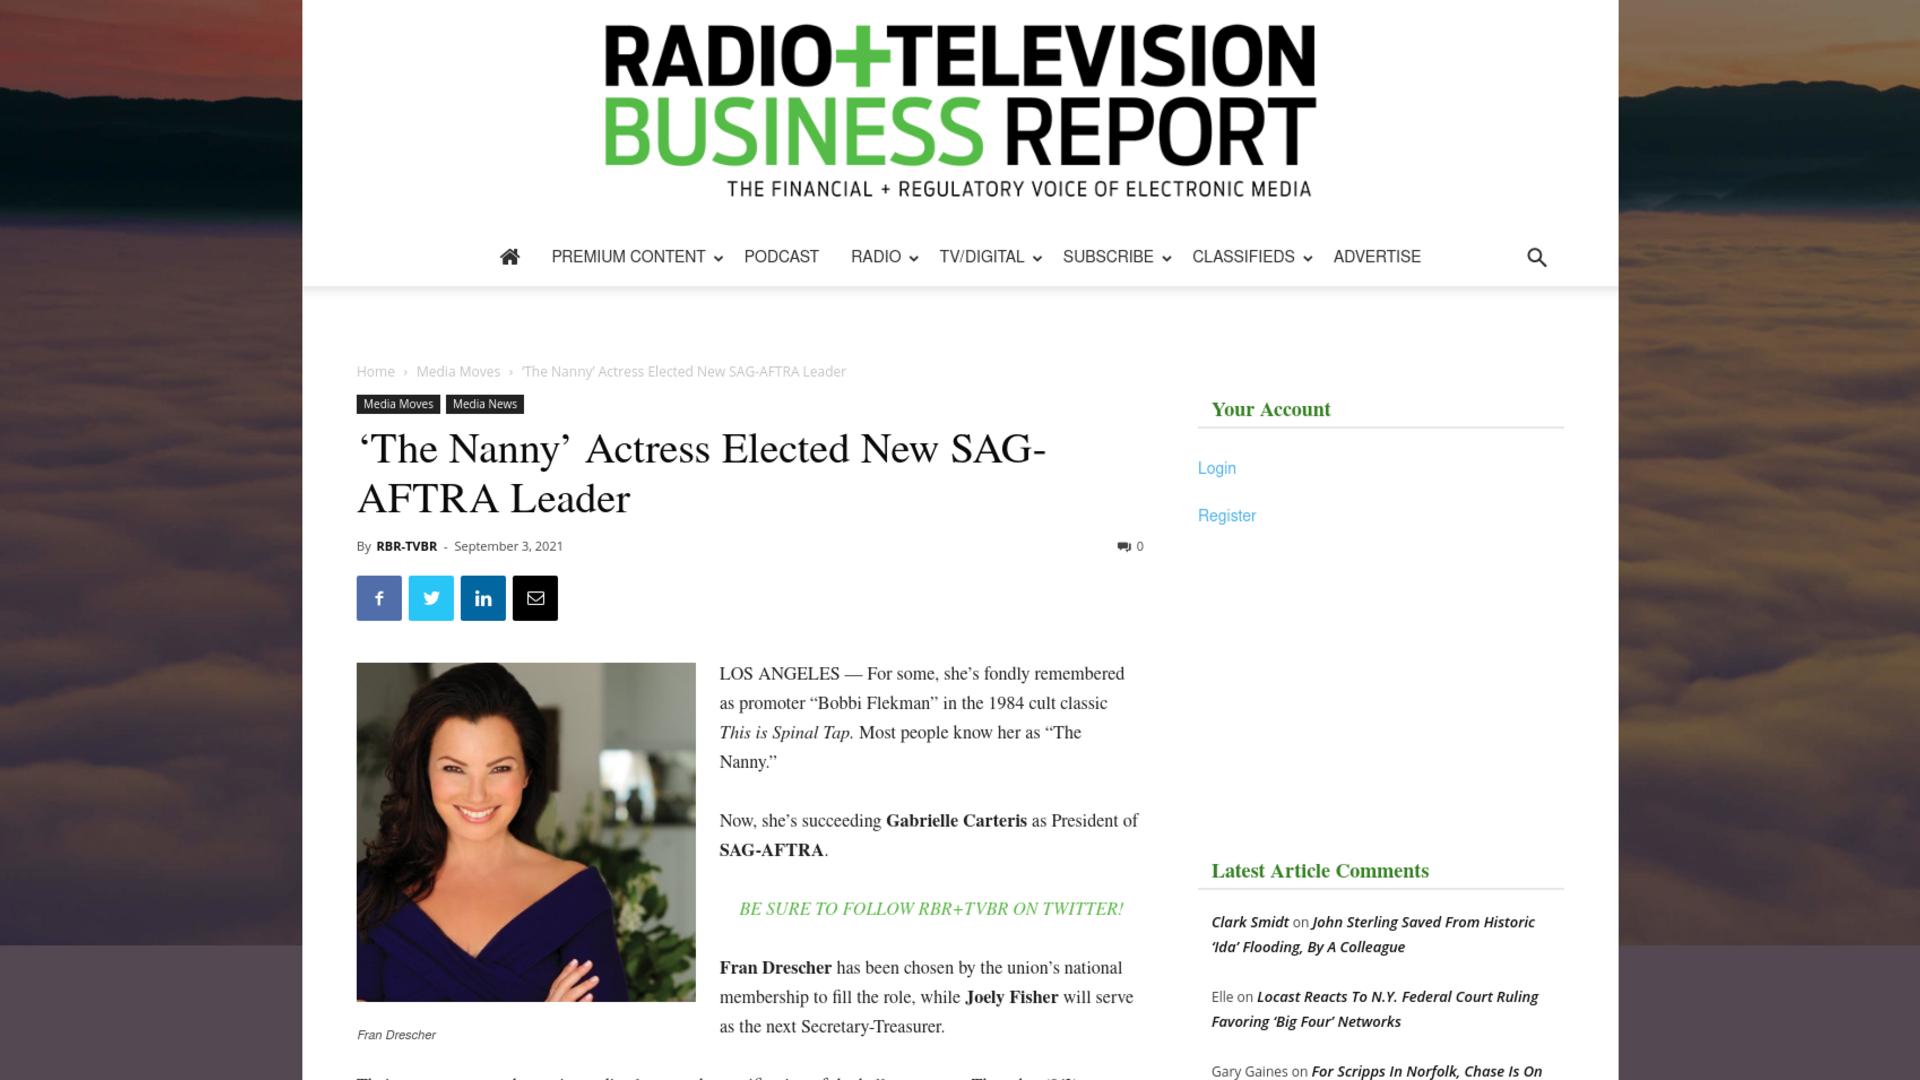 Fairness Rocks News 'The Nanny' Actress Elected New SAG-AFTRA Leader